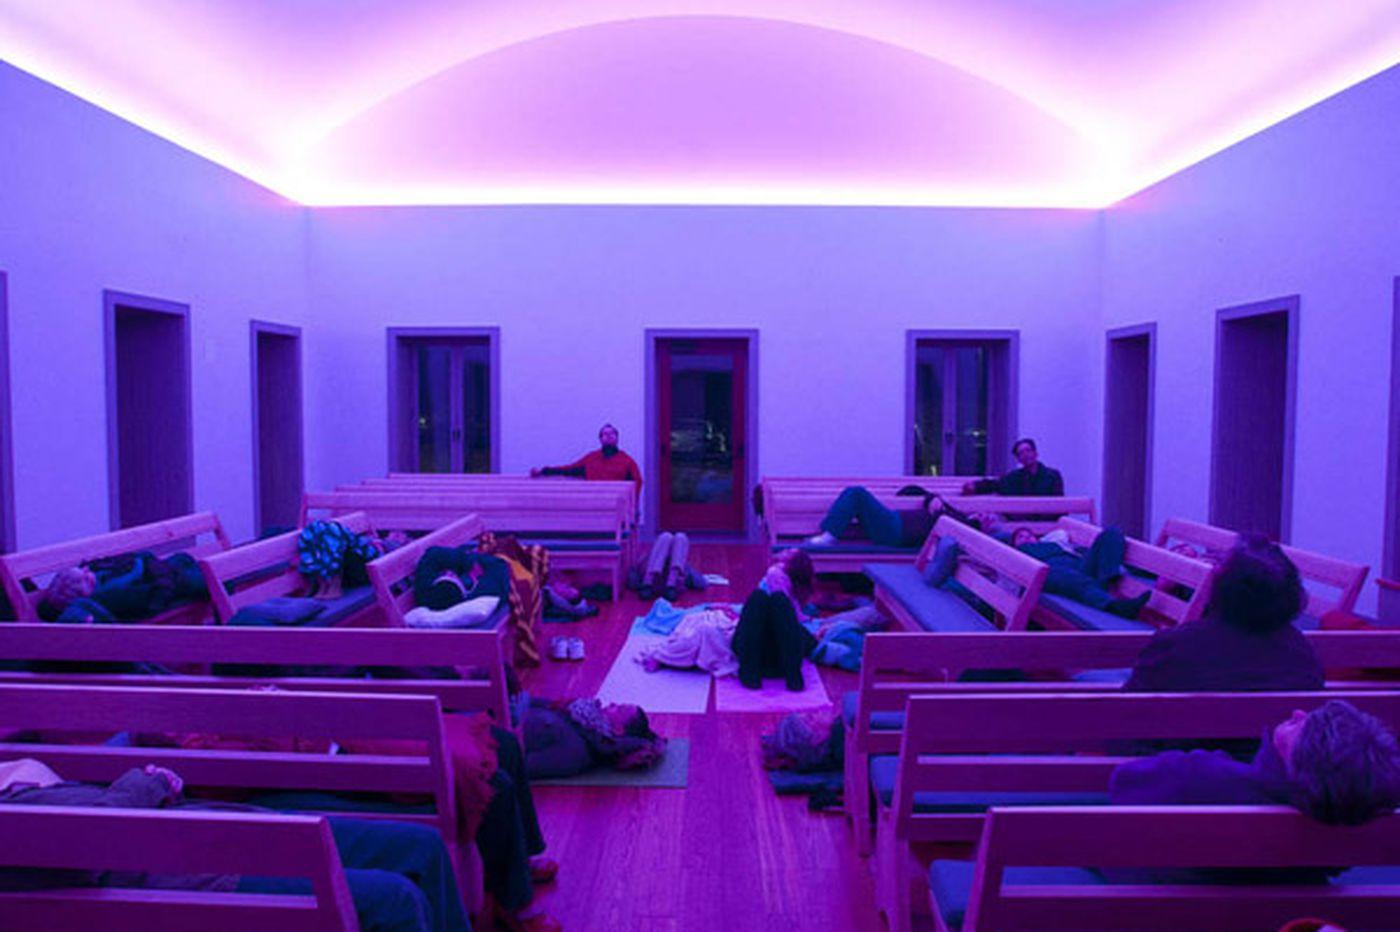 Changing Skyline: Art installation transforms Chestnut Hill meetinghouse